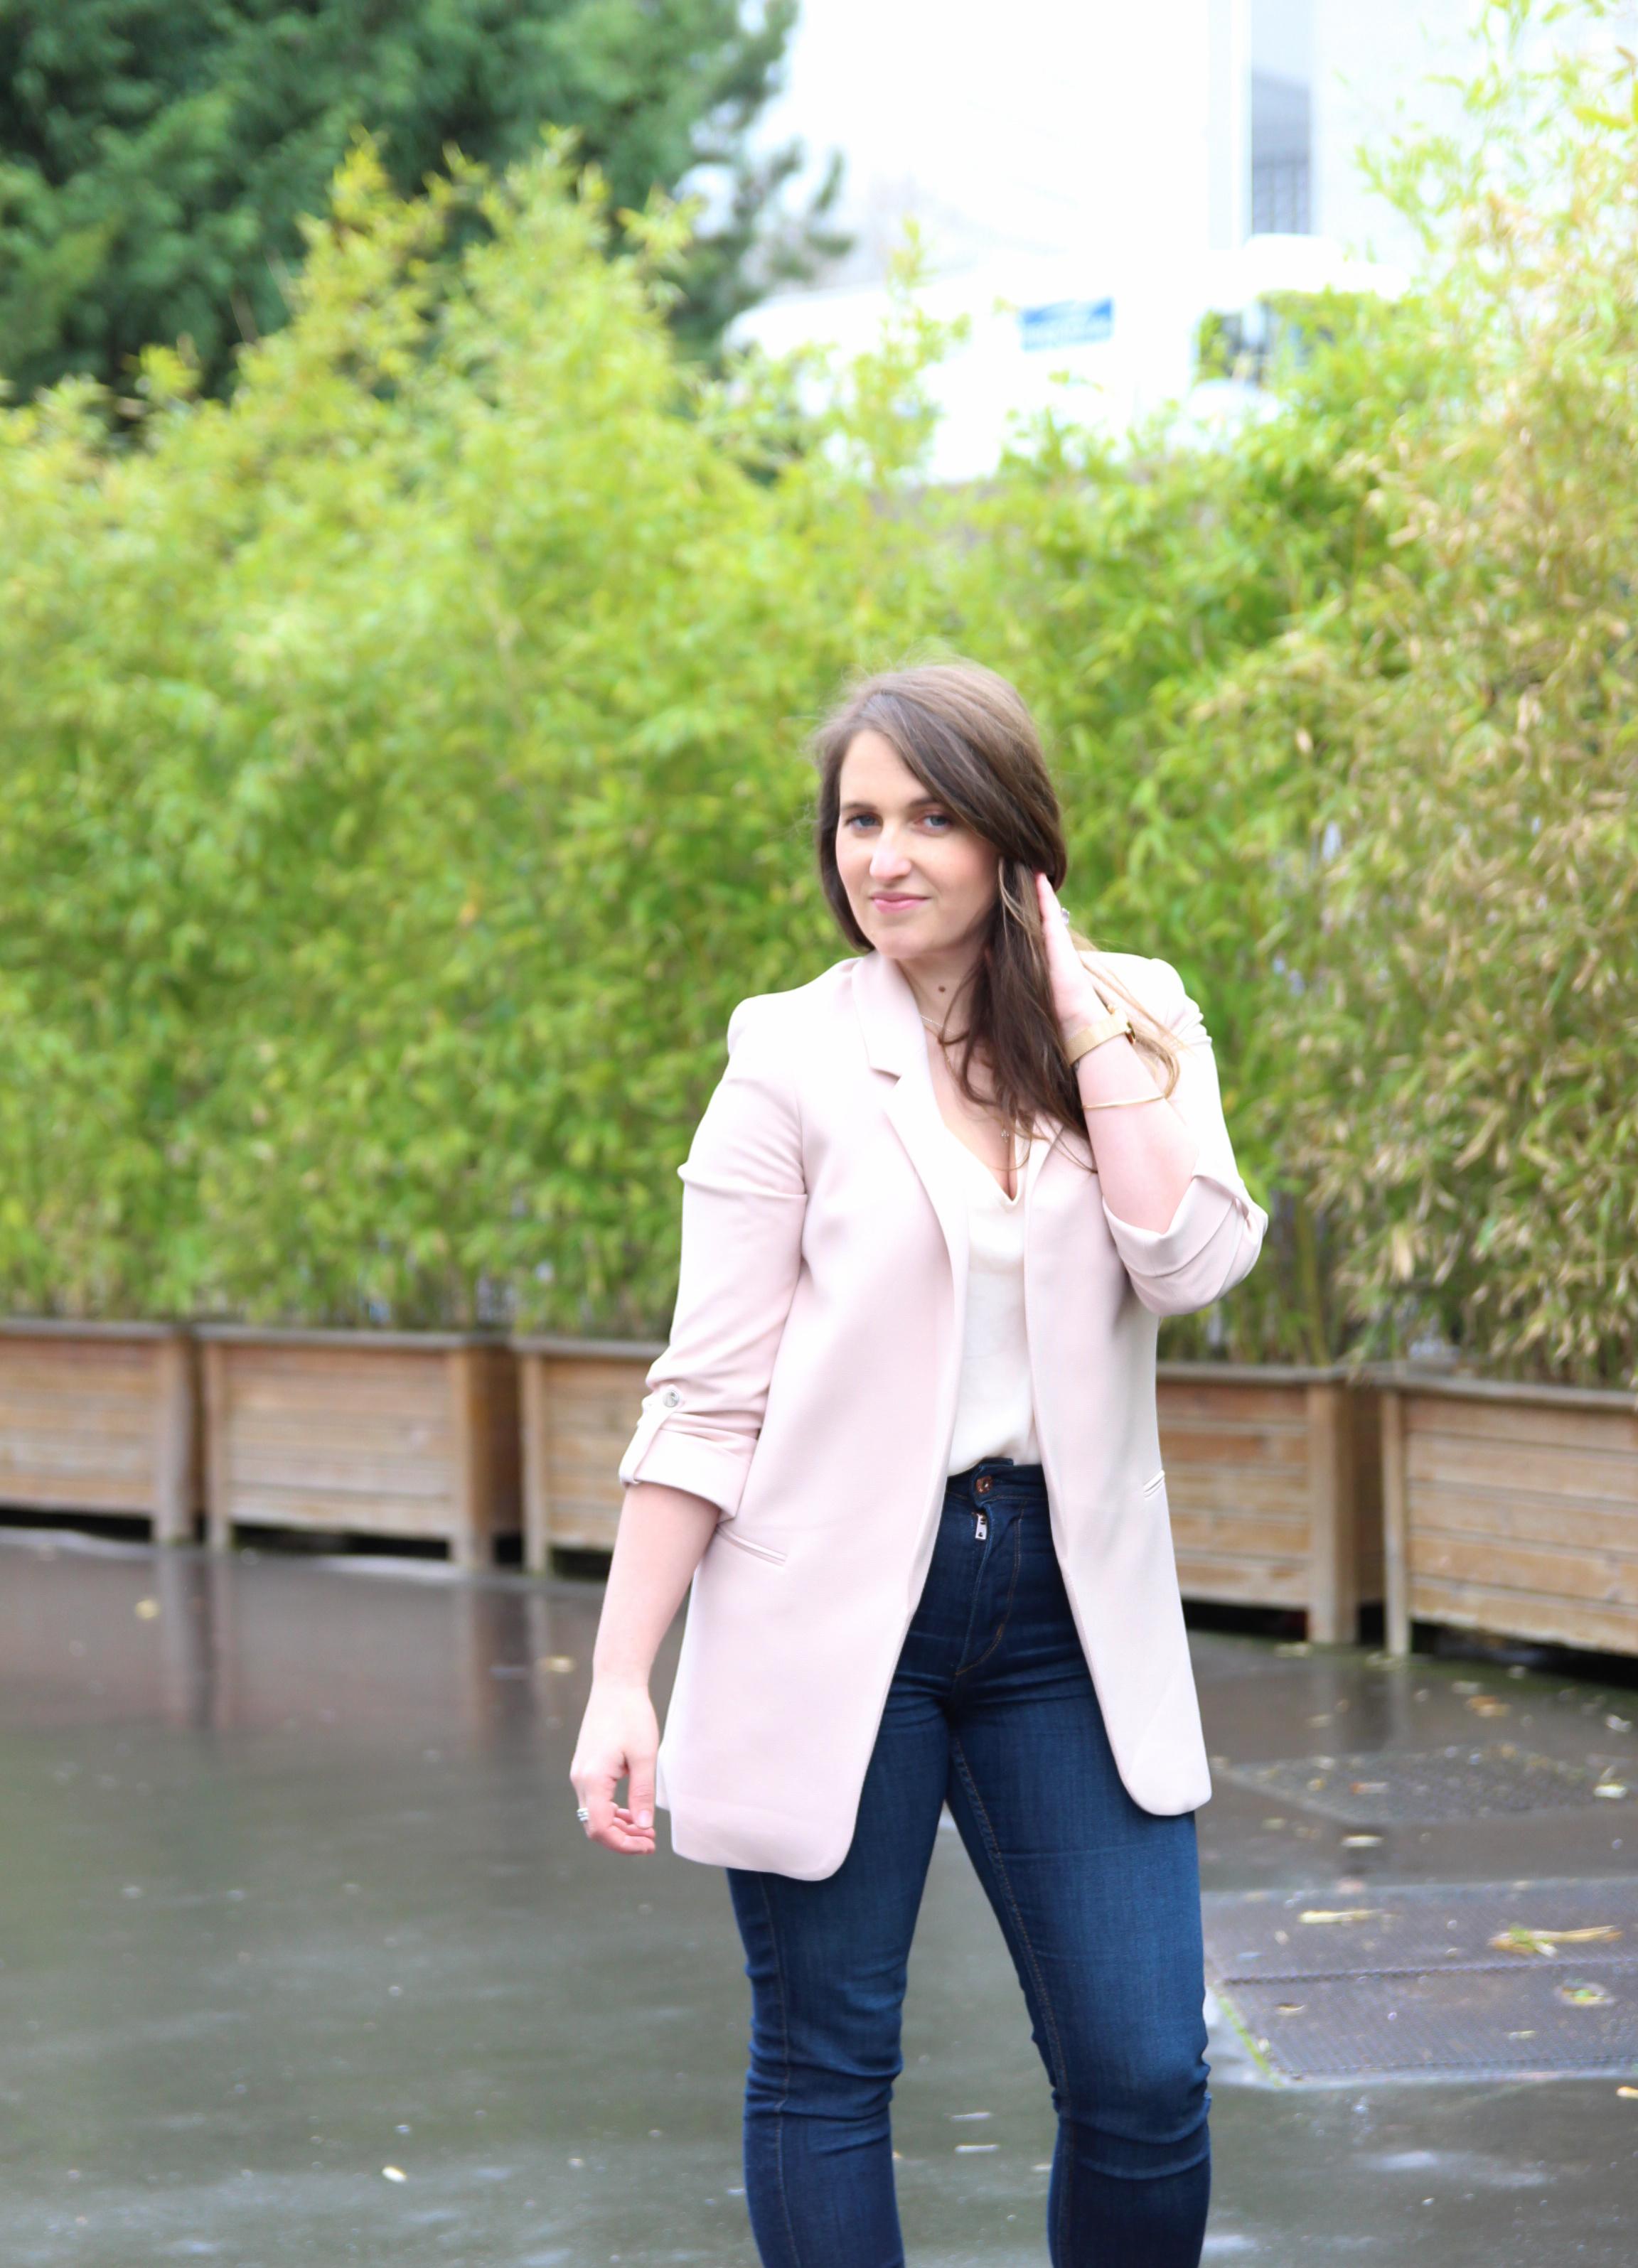 fashionblogger-influencer-jacket-zara-rosepastel-paris-seralynepointcom-2017-03-21 115650